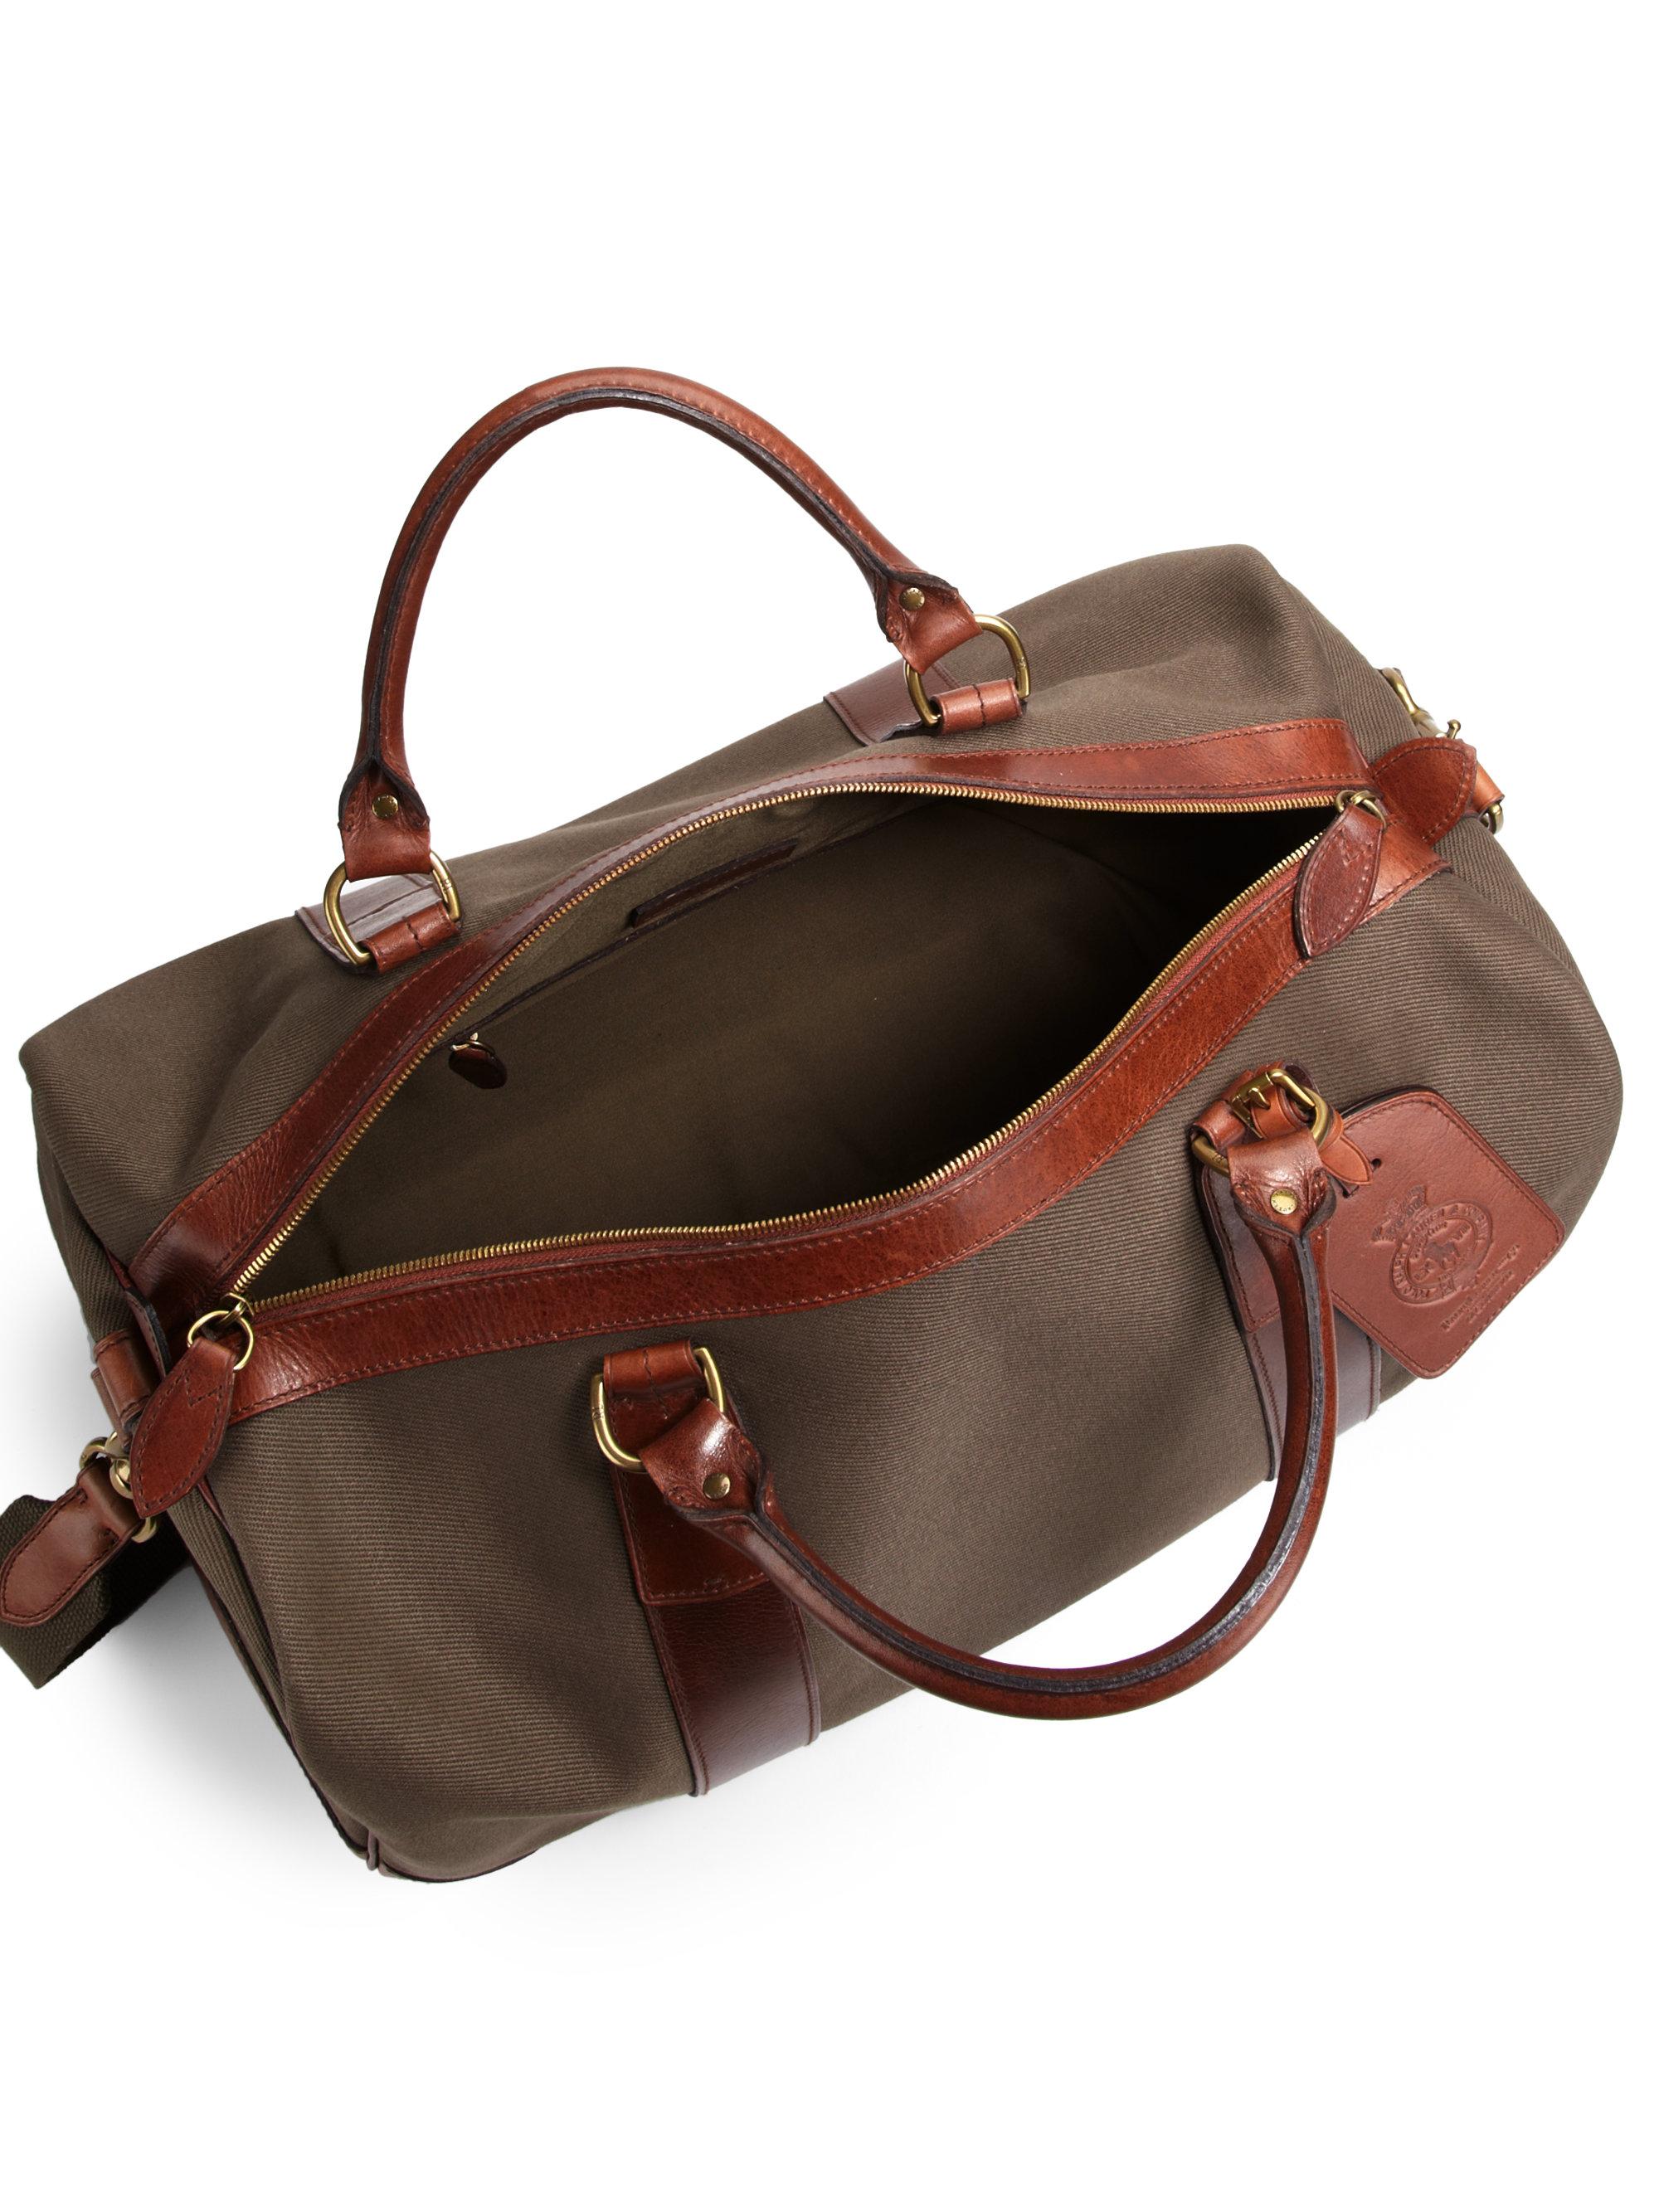 ... Yosemite Nylon Duffel Bag in Green  low priced 69799 8349a ... lyst  polo ralph lauren waxed twill duffel in green ... bda1e13b6a